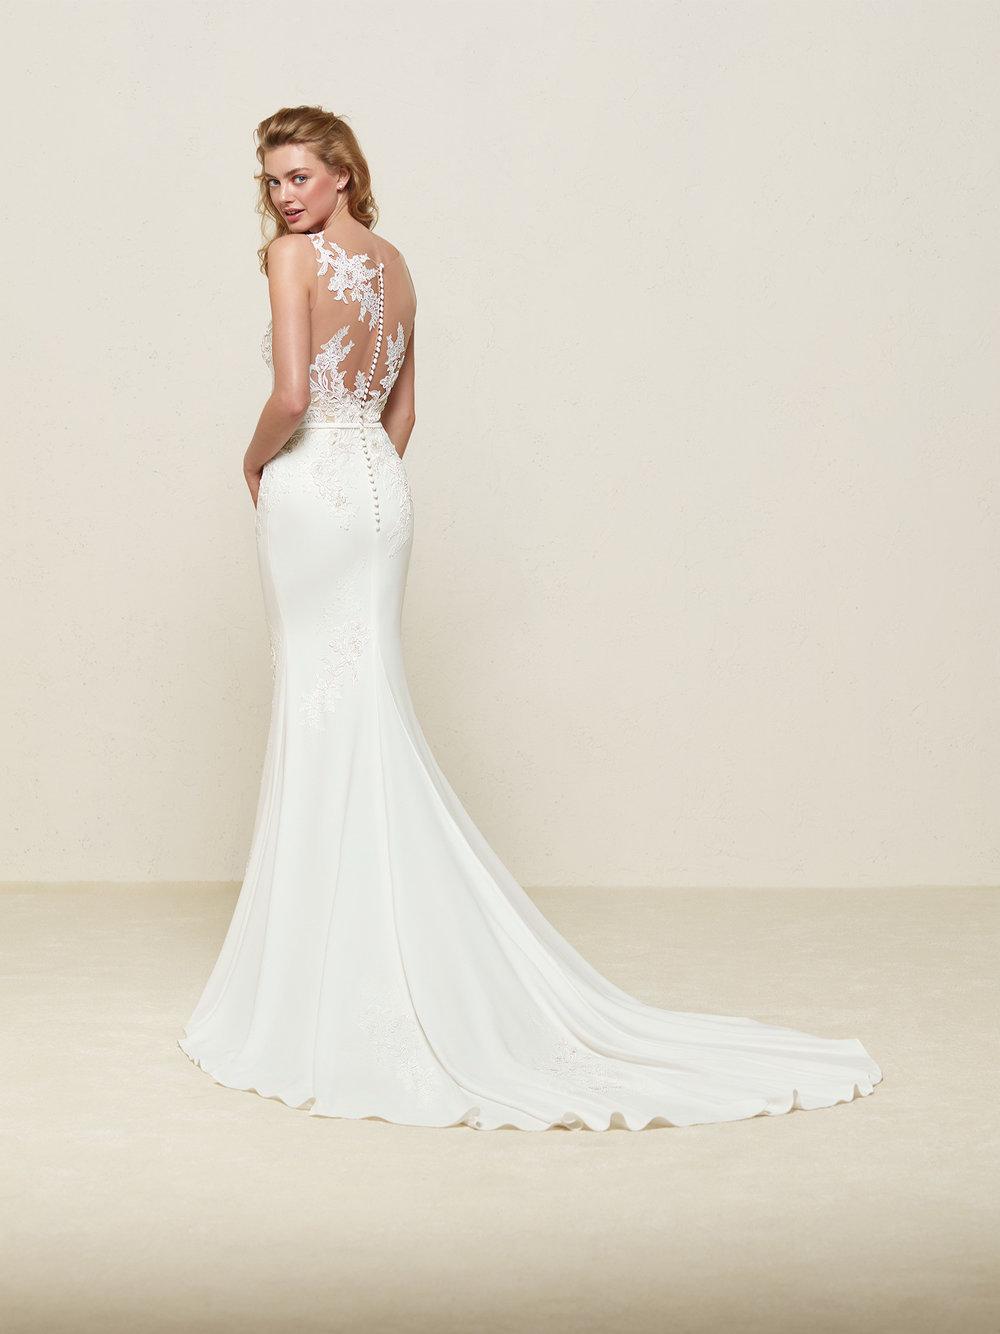 pronovias-house-of-white-bridal-boutique-indiana